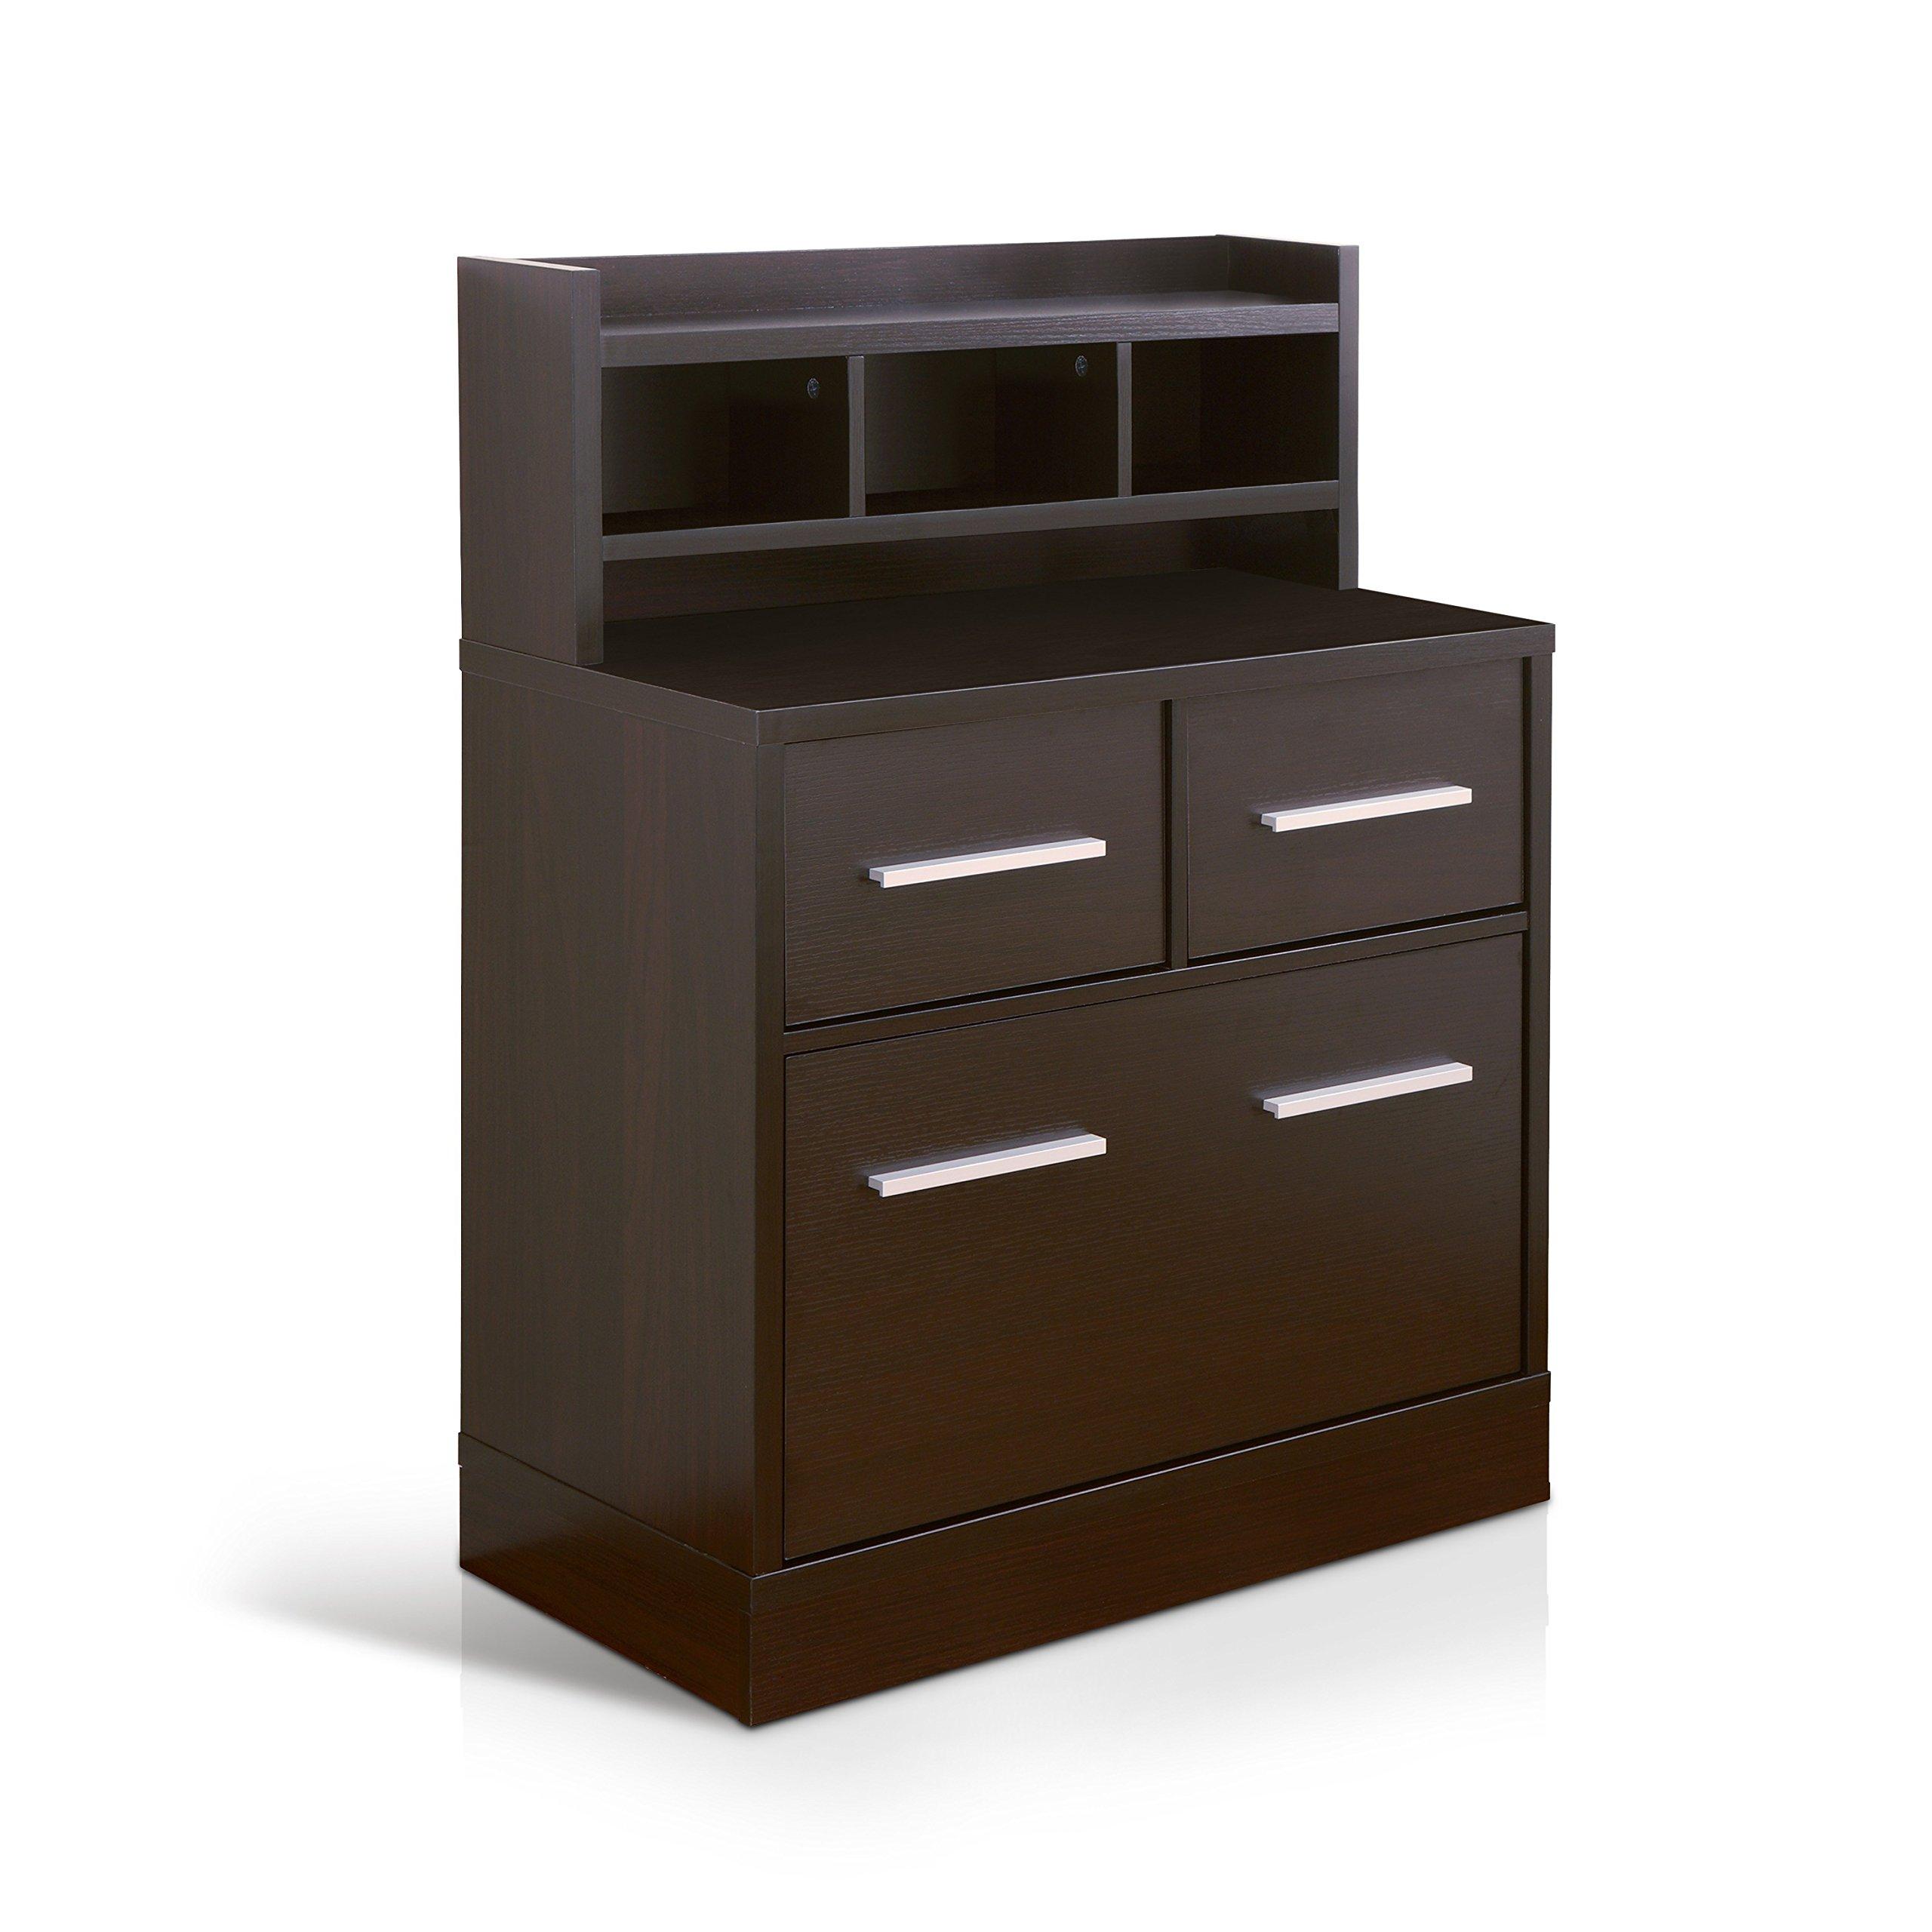 Modern Veneer Wood Cappuccino Multi Storage File Cabinet Work Station